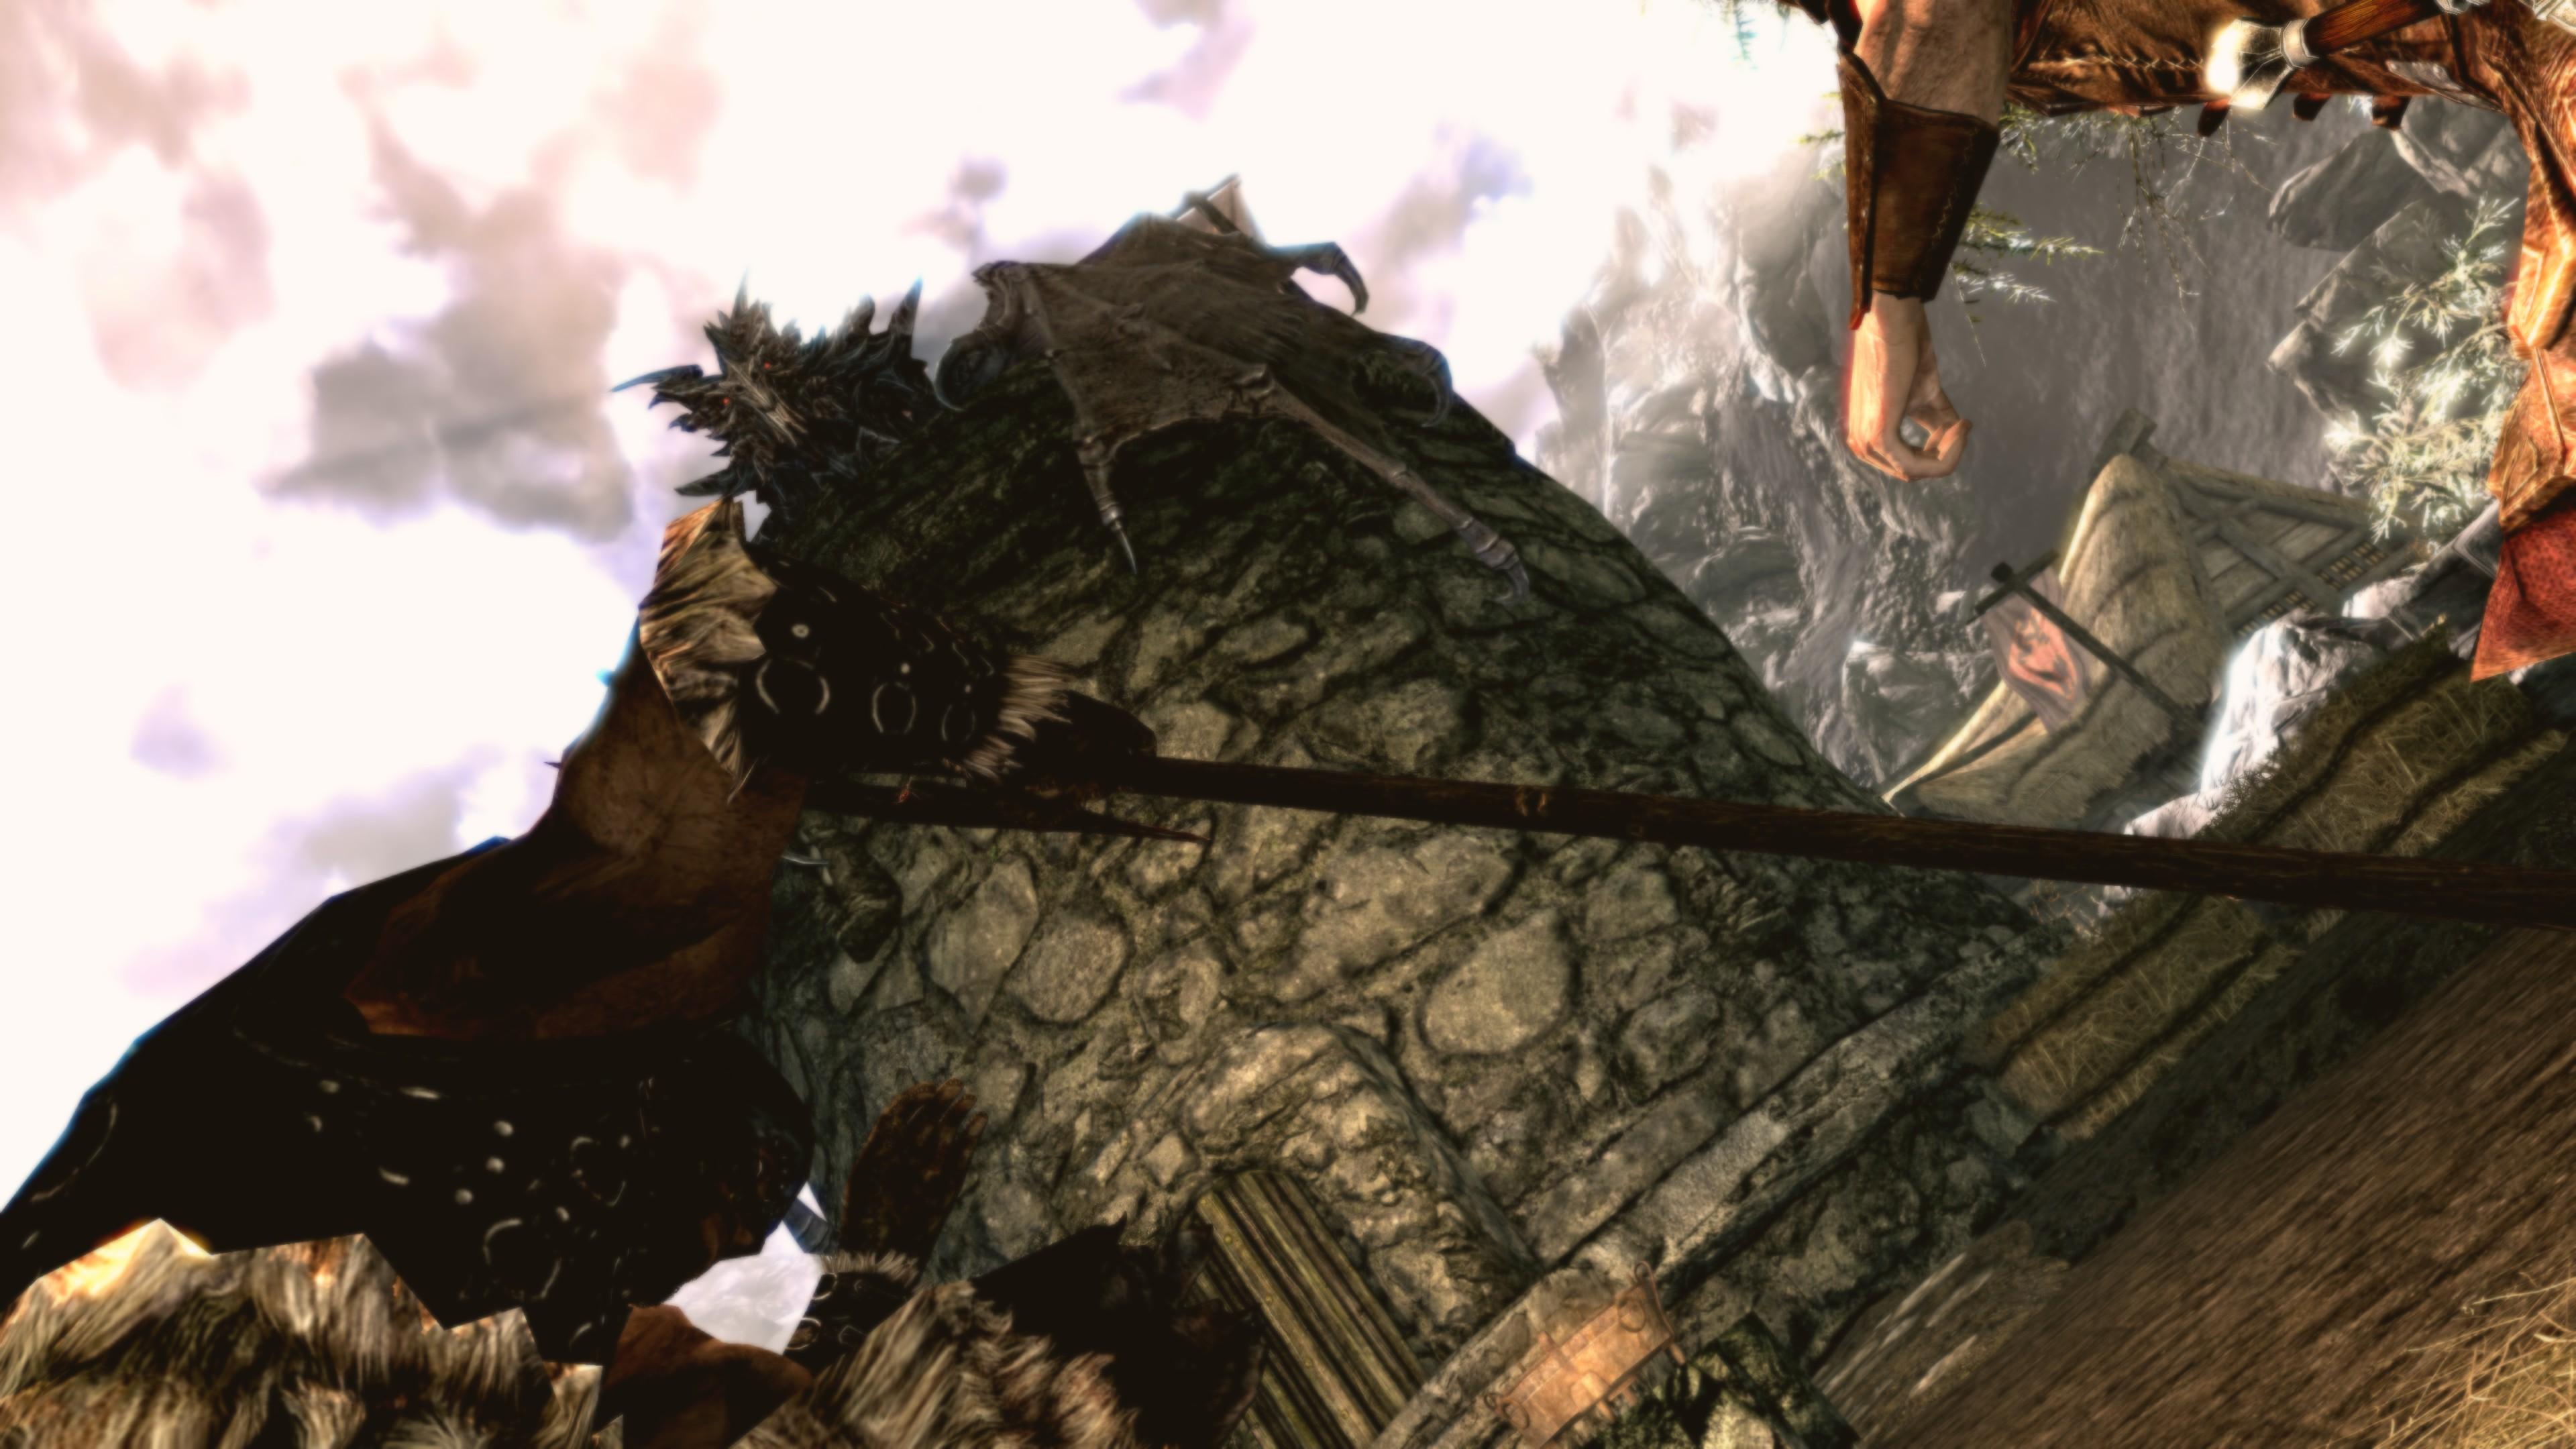 20191121130915_1.jpg - The Elder Scrolls 5: Skyrim